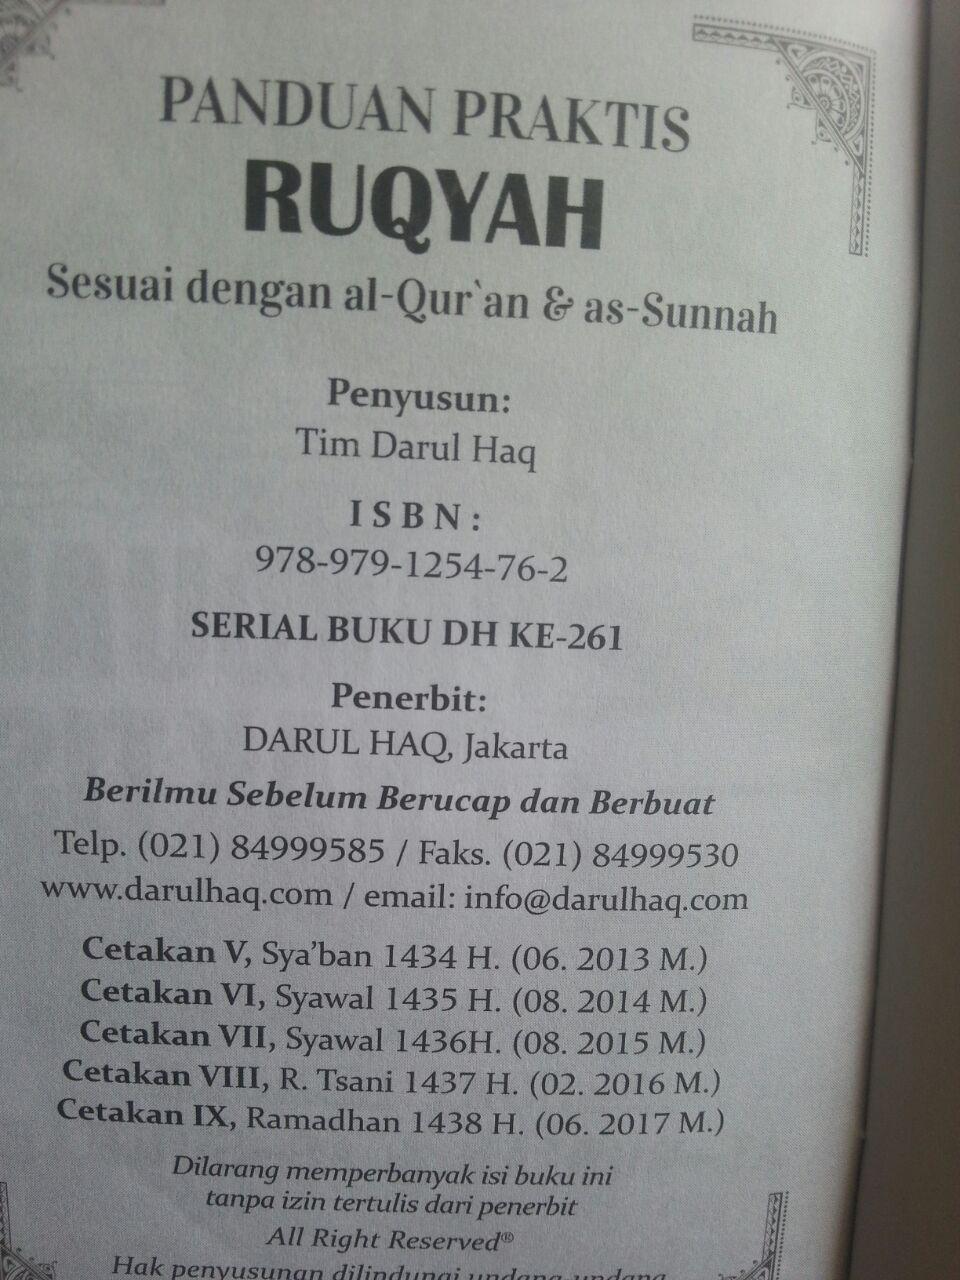 Buku Saku Panduan Praktis Ruqyah Sesuai Al-Quran As-Sunnah isi 2